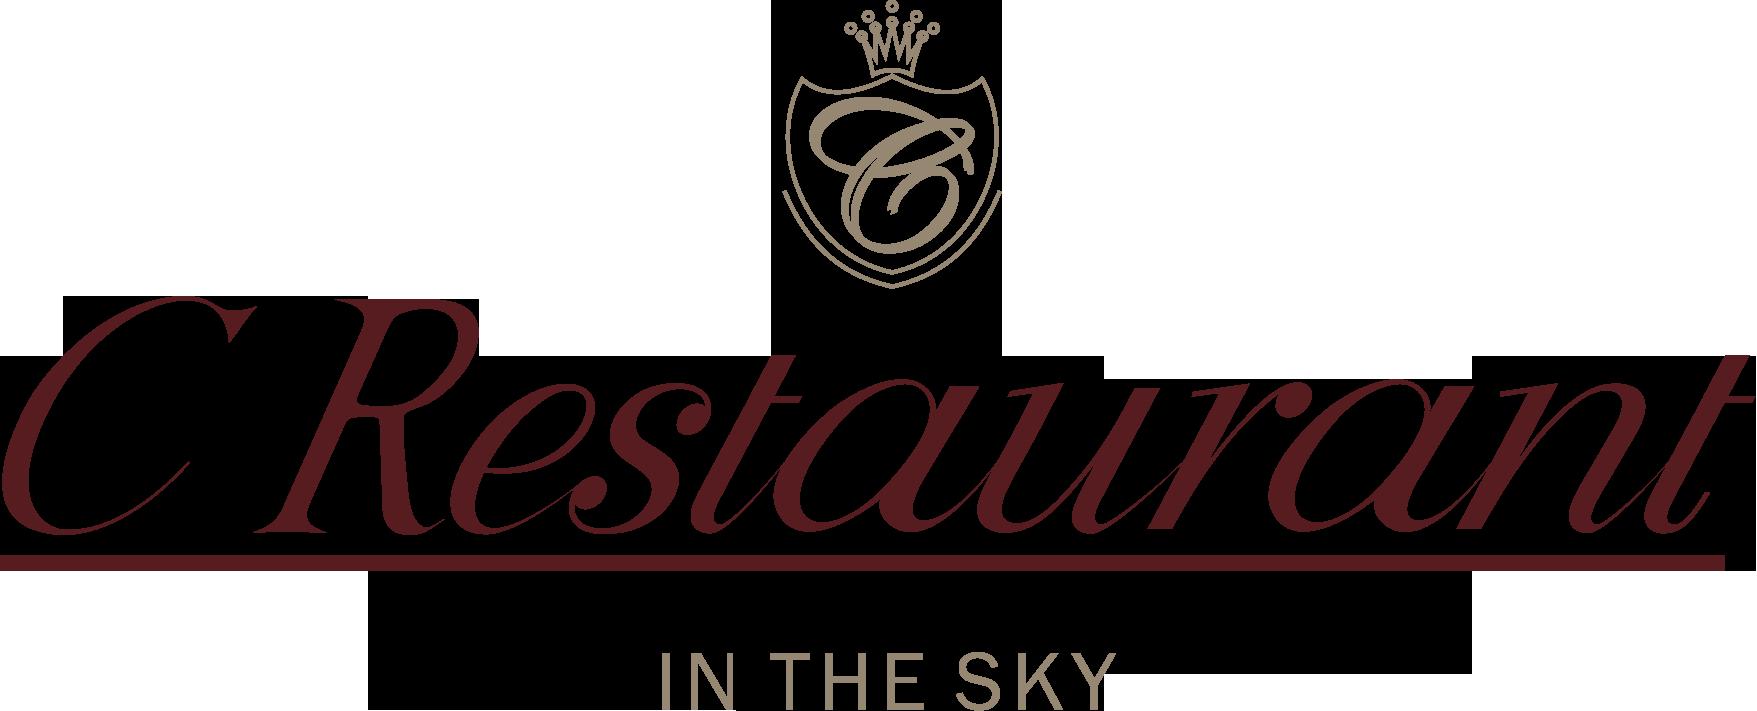 C Restaurant Logo (Hi Res)